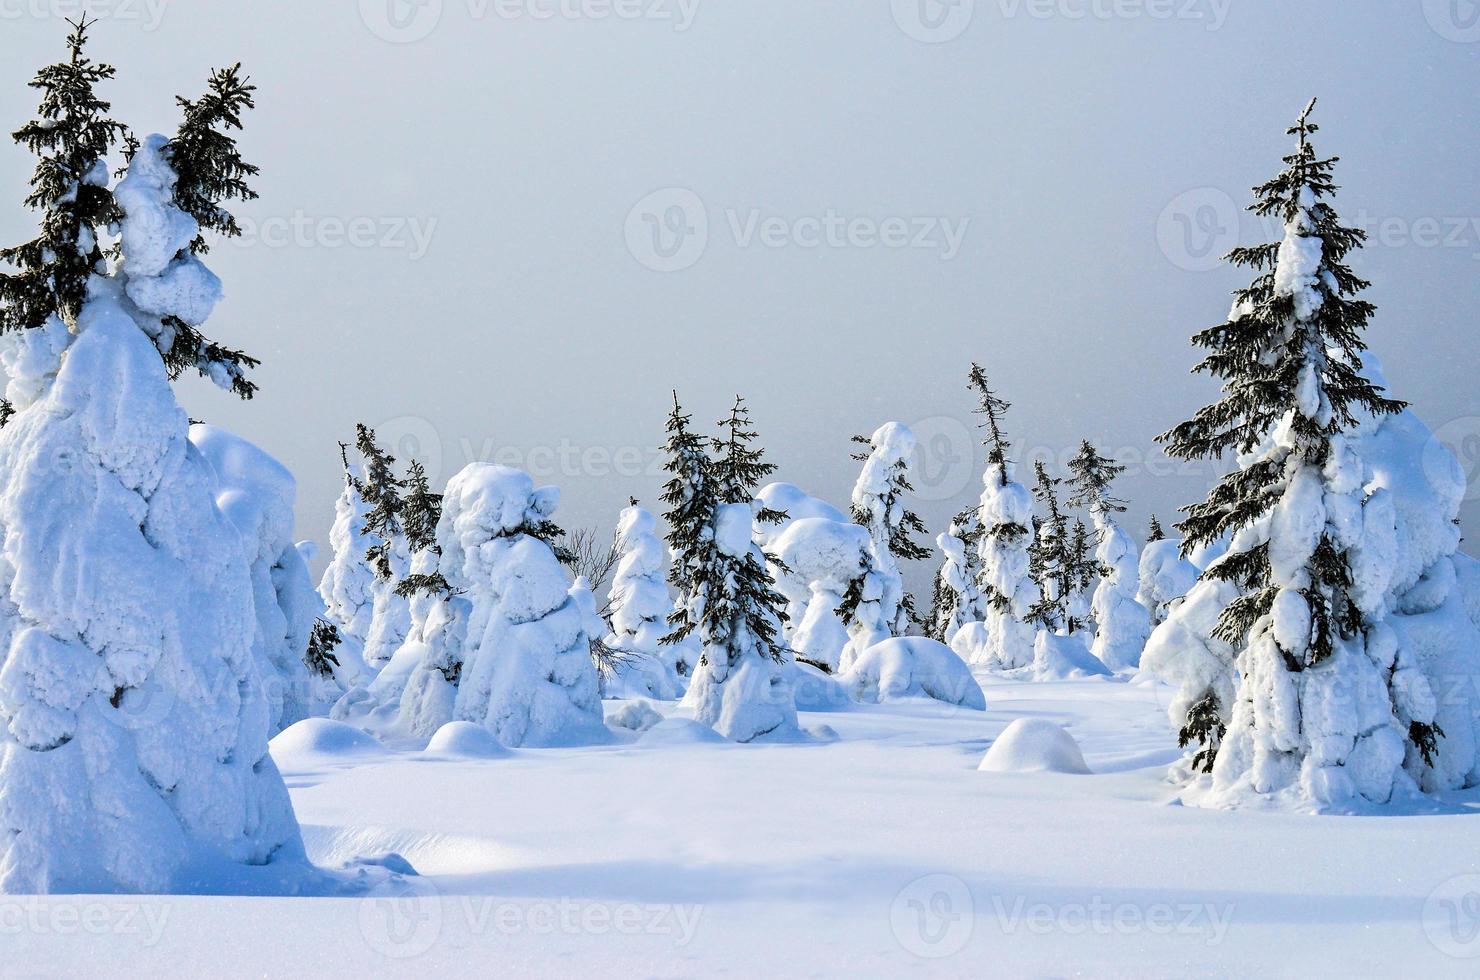 Trees in snow photo